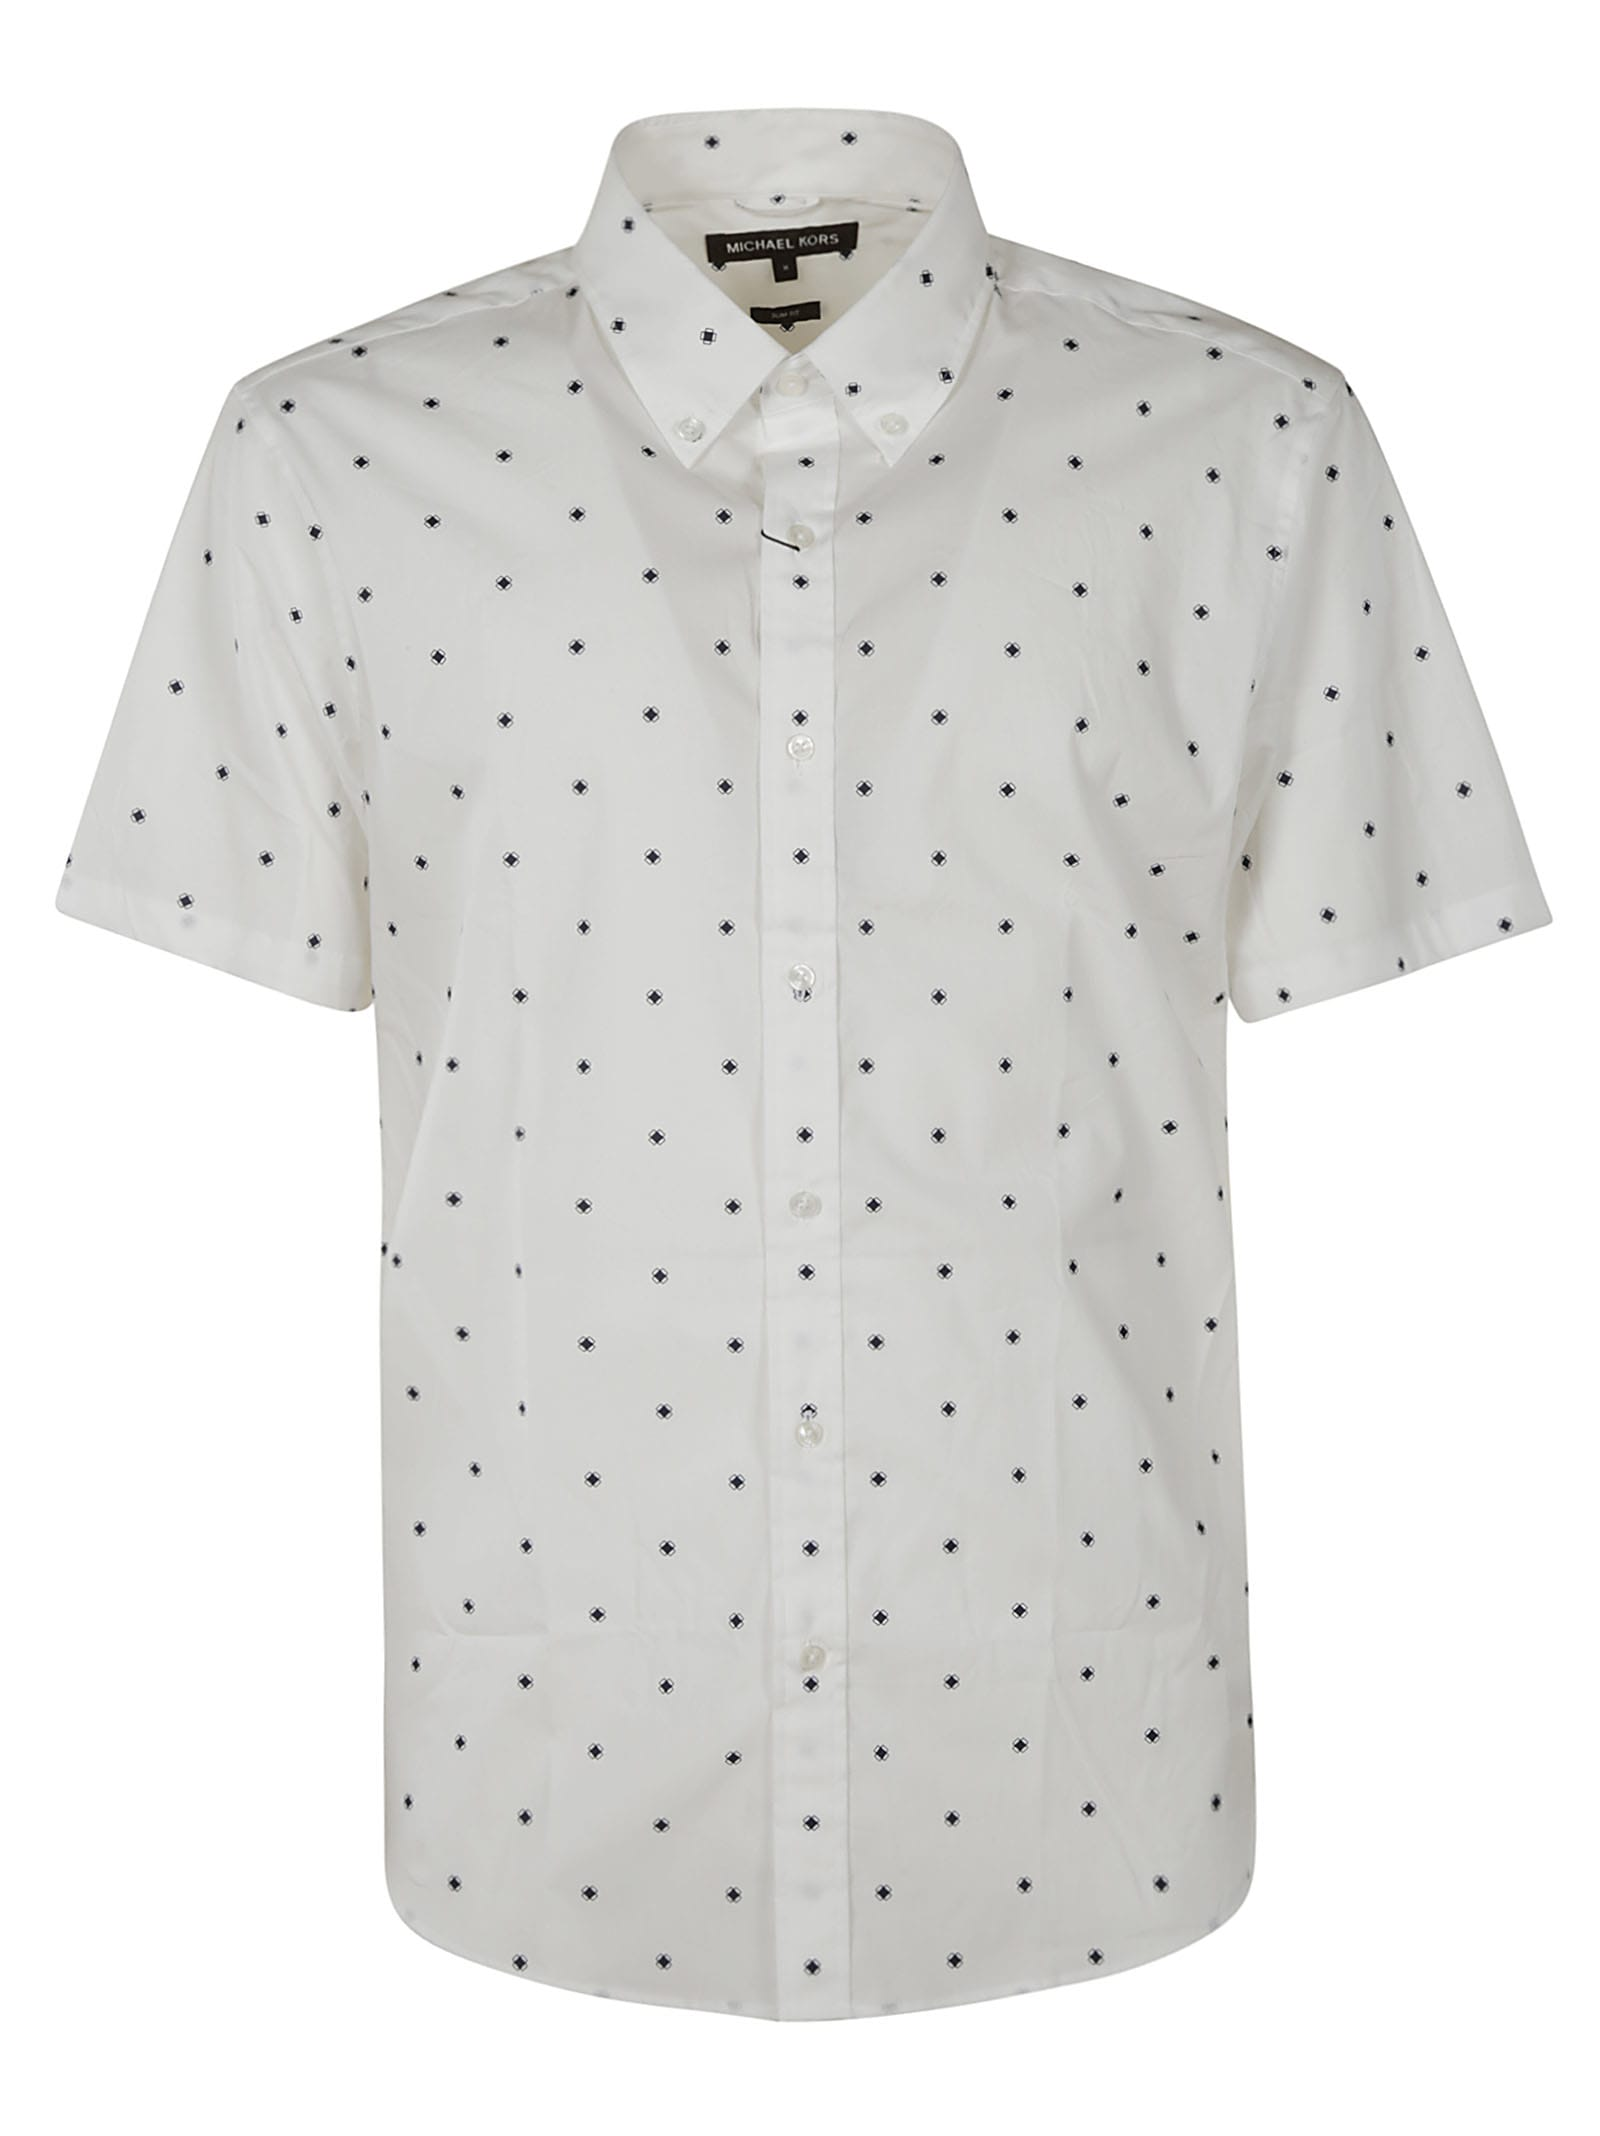 Michael Kors Dotted Print Short-sleeve Shirt